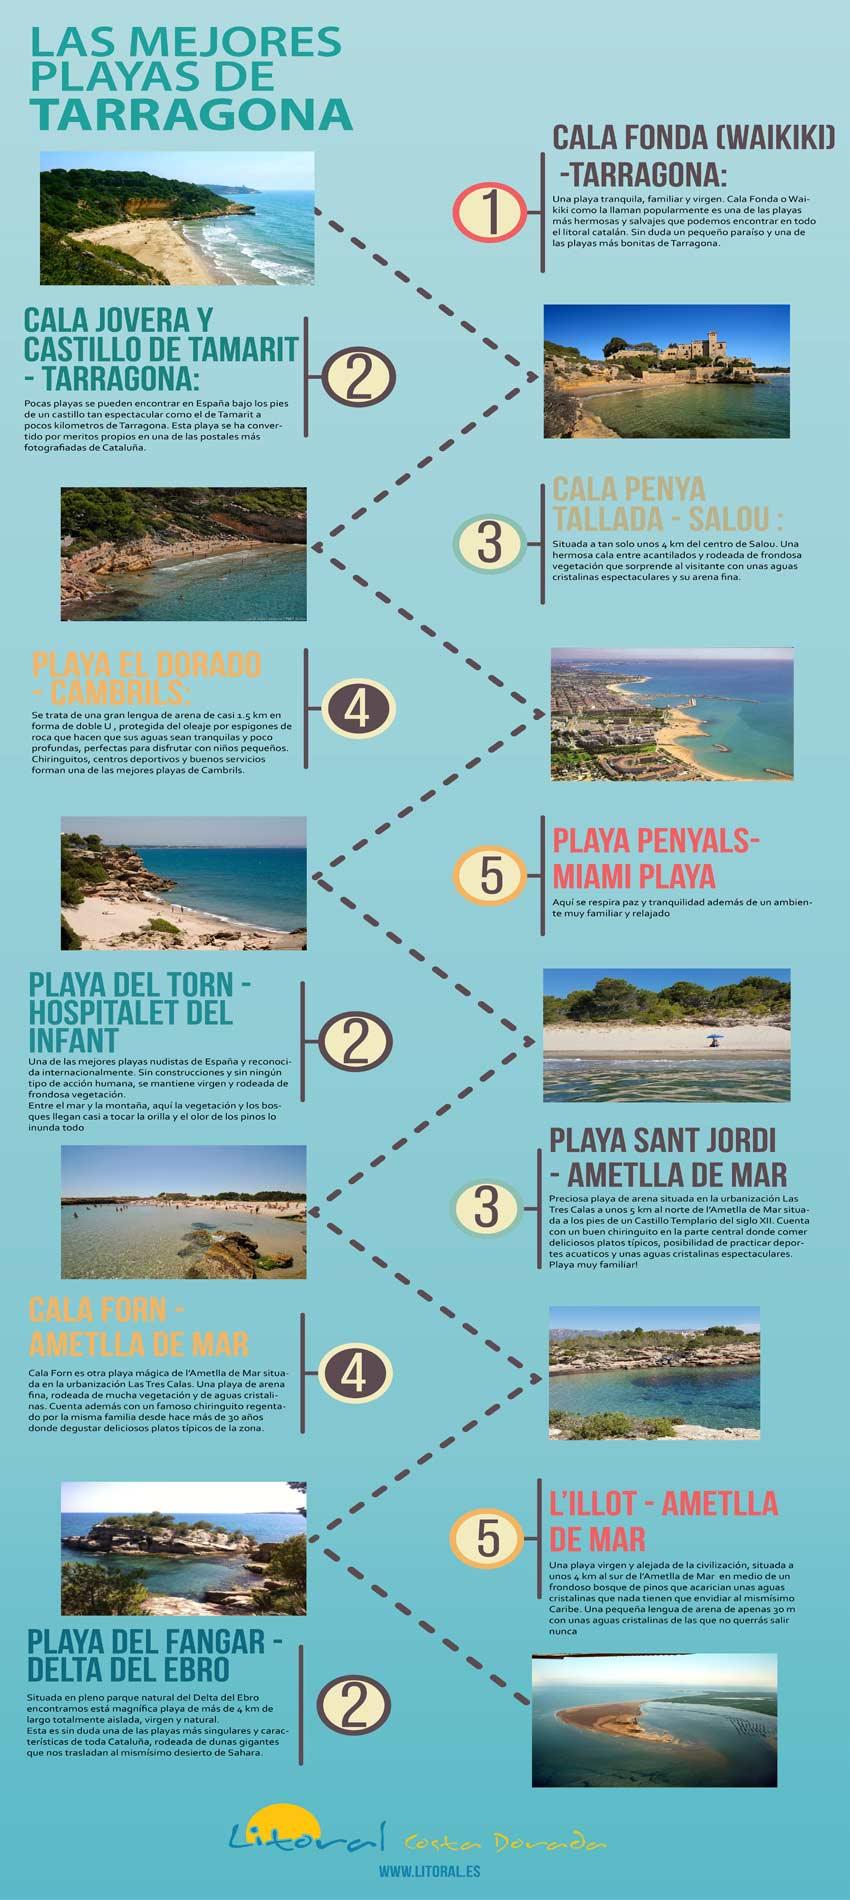 Infografia de las mejores playas de Tarragona